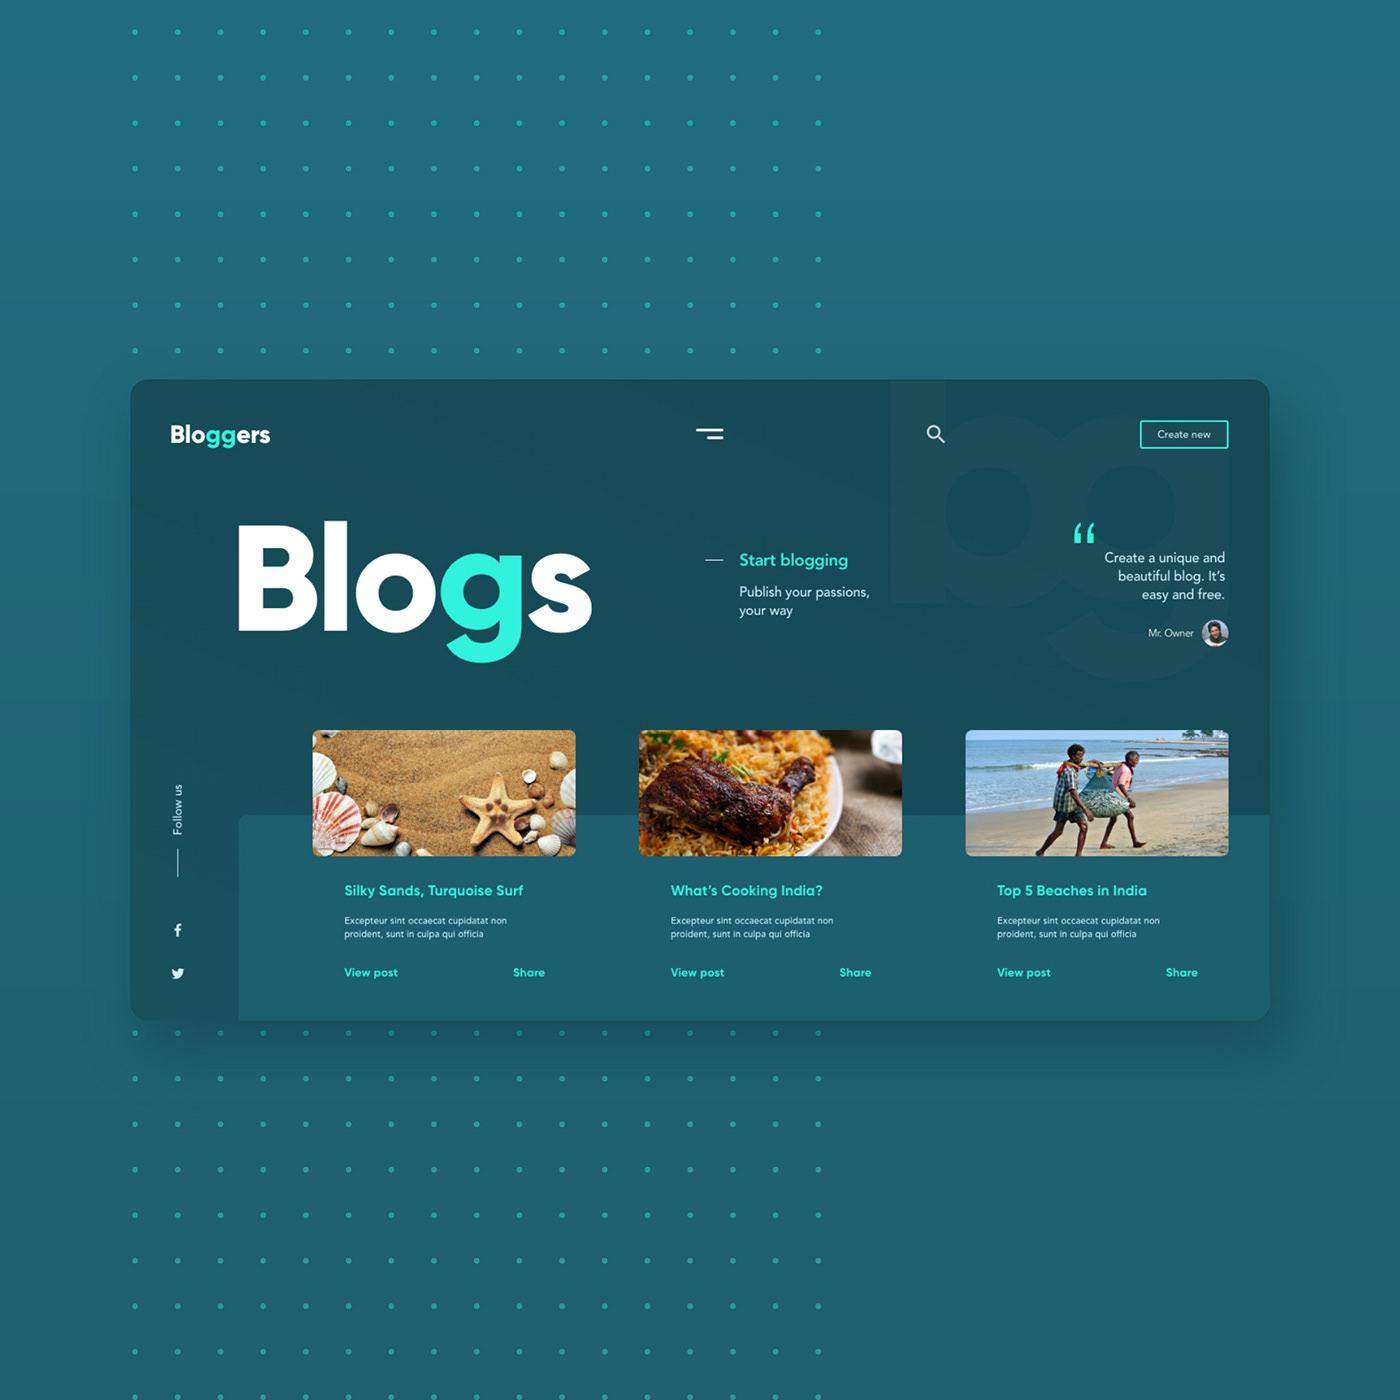 Adobe XD blogs designer designs Logo Designs ui designs UI inspiration  UX Designs web designs Webdevelopment